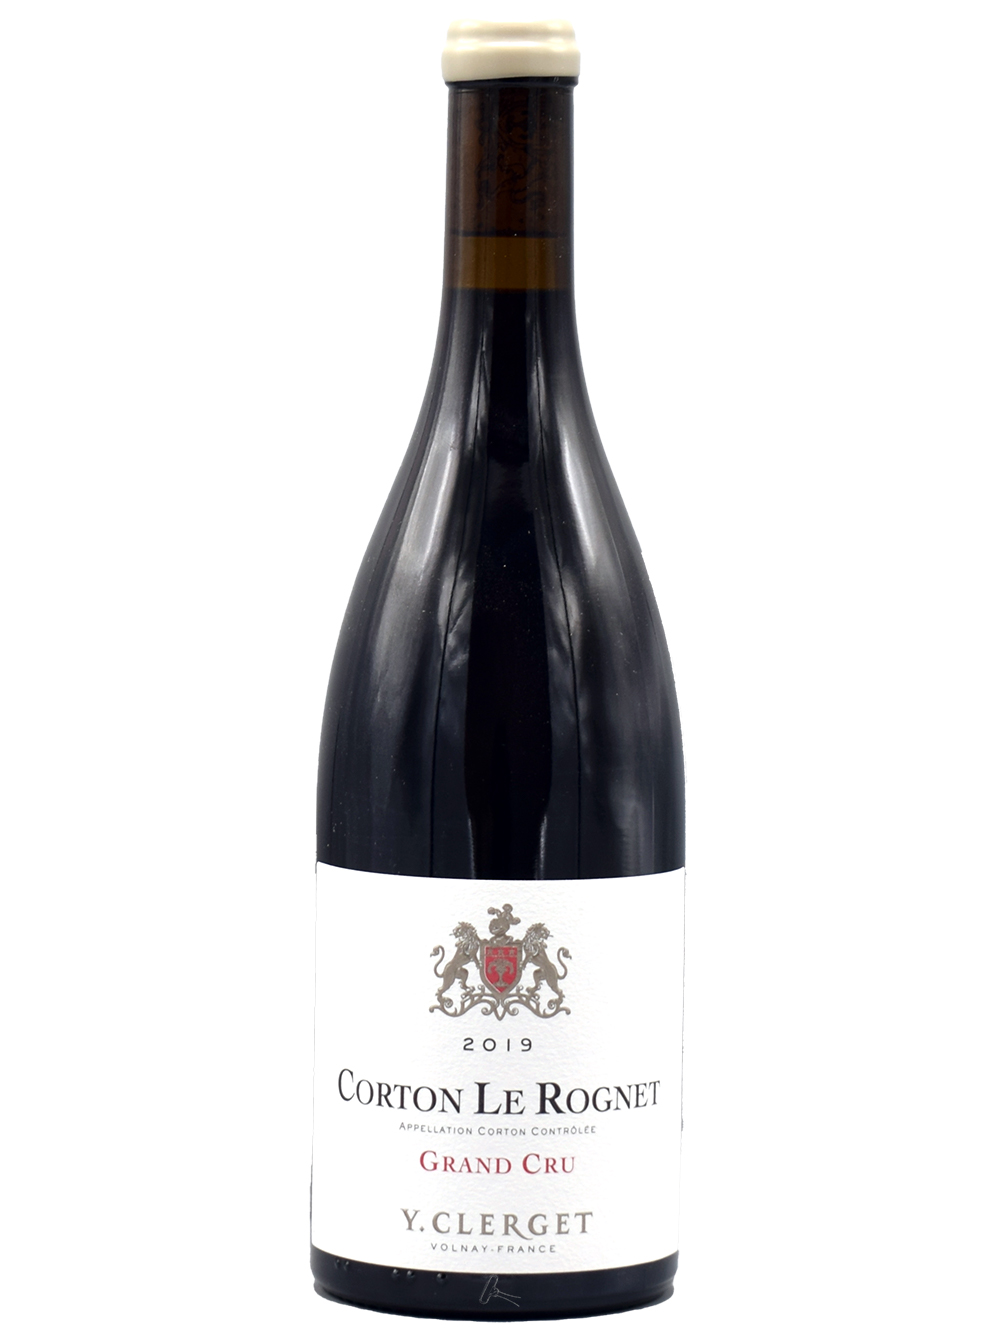 Corton Le Rognet Grand Cru